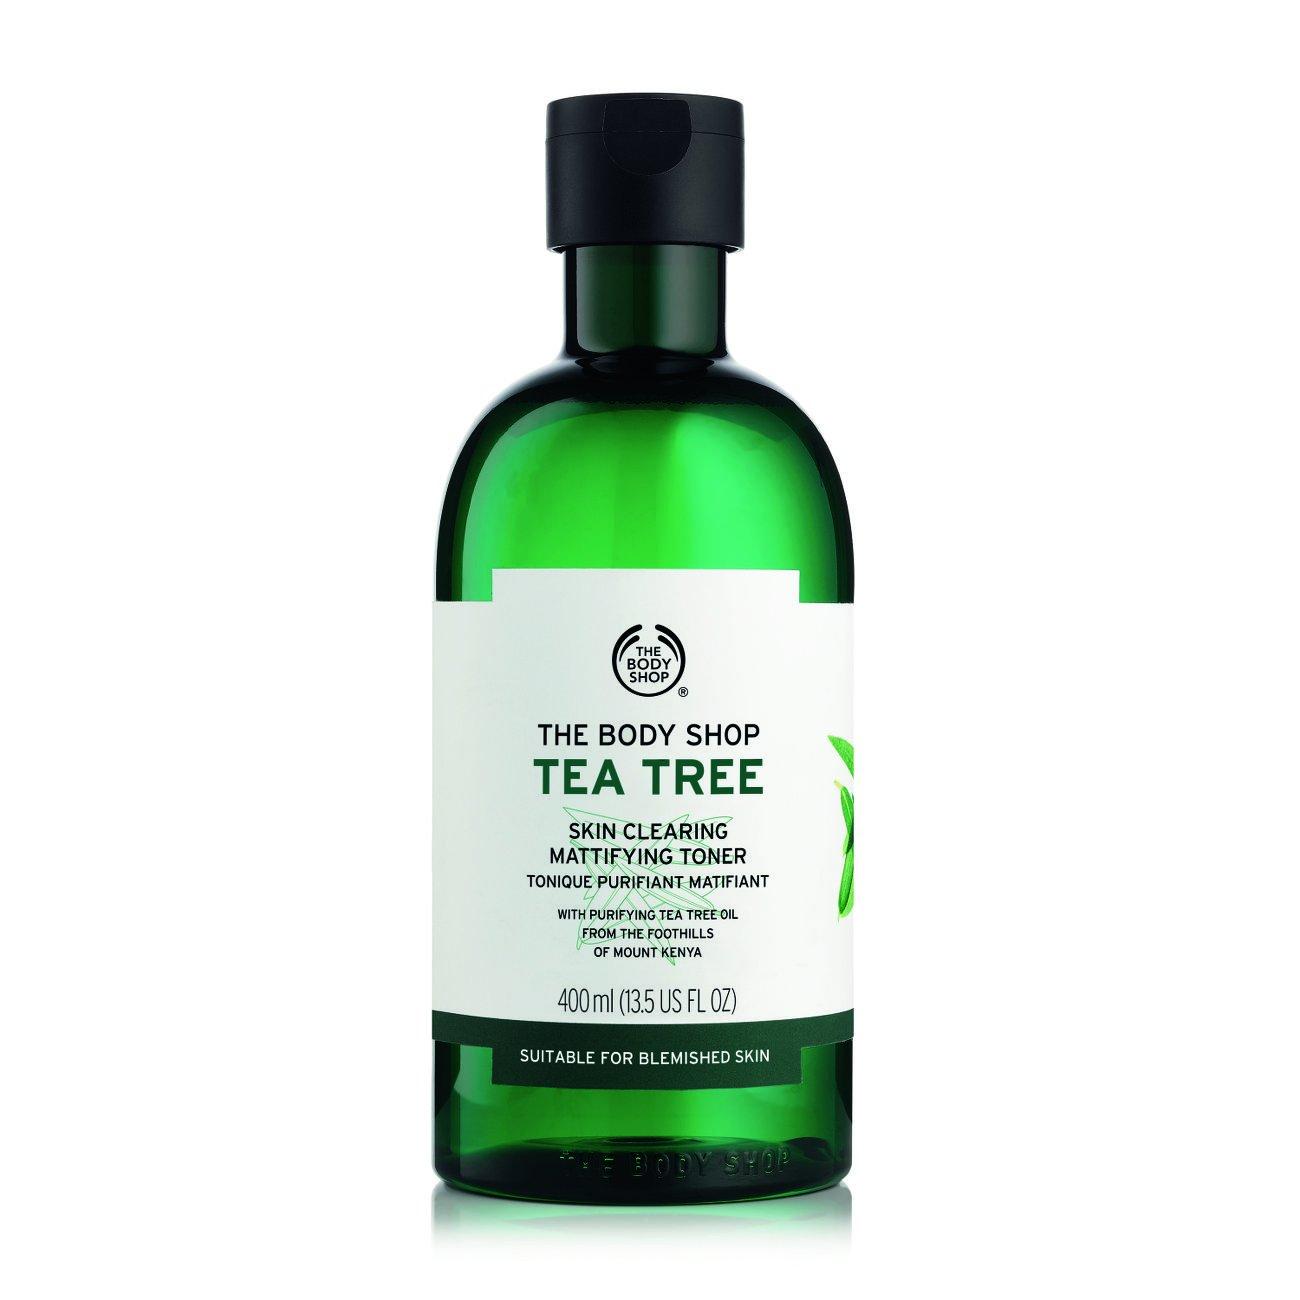 The Body Shop Tea Tree Skin Clearing Mattifying Toner, 13.5 Fl Oz (Vegan) by The Body Shop